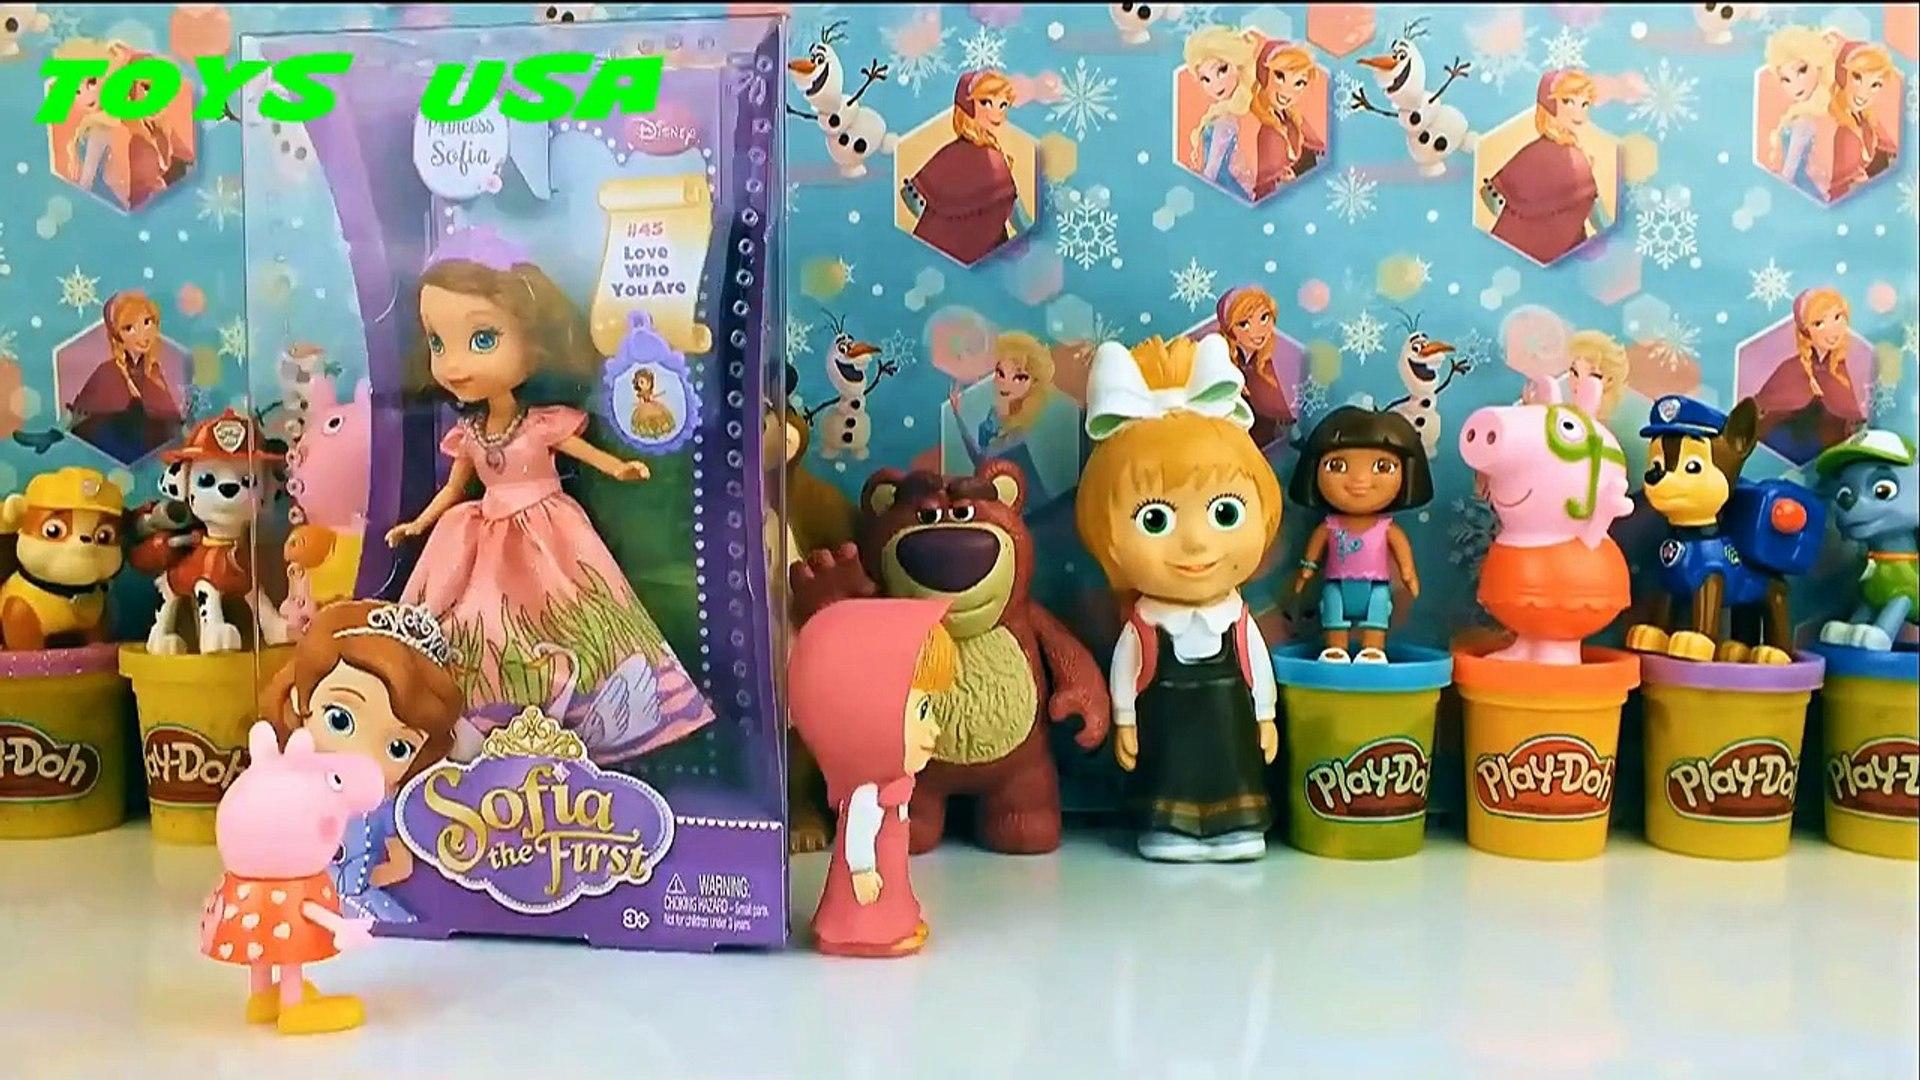 Sofia the First Princess Sofia Disney Junior София Прекрасная Принцесса София meet new friends peppa